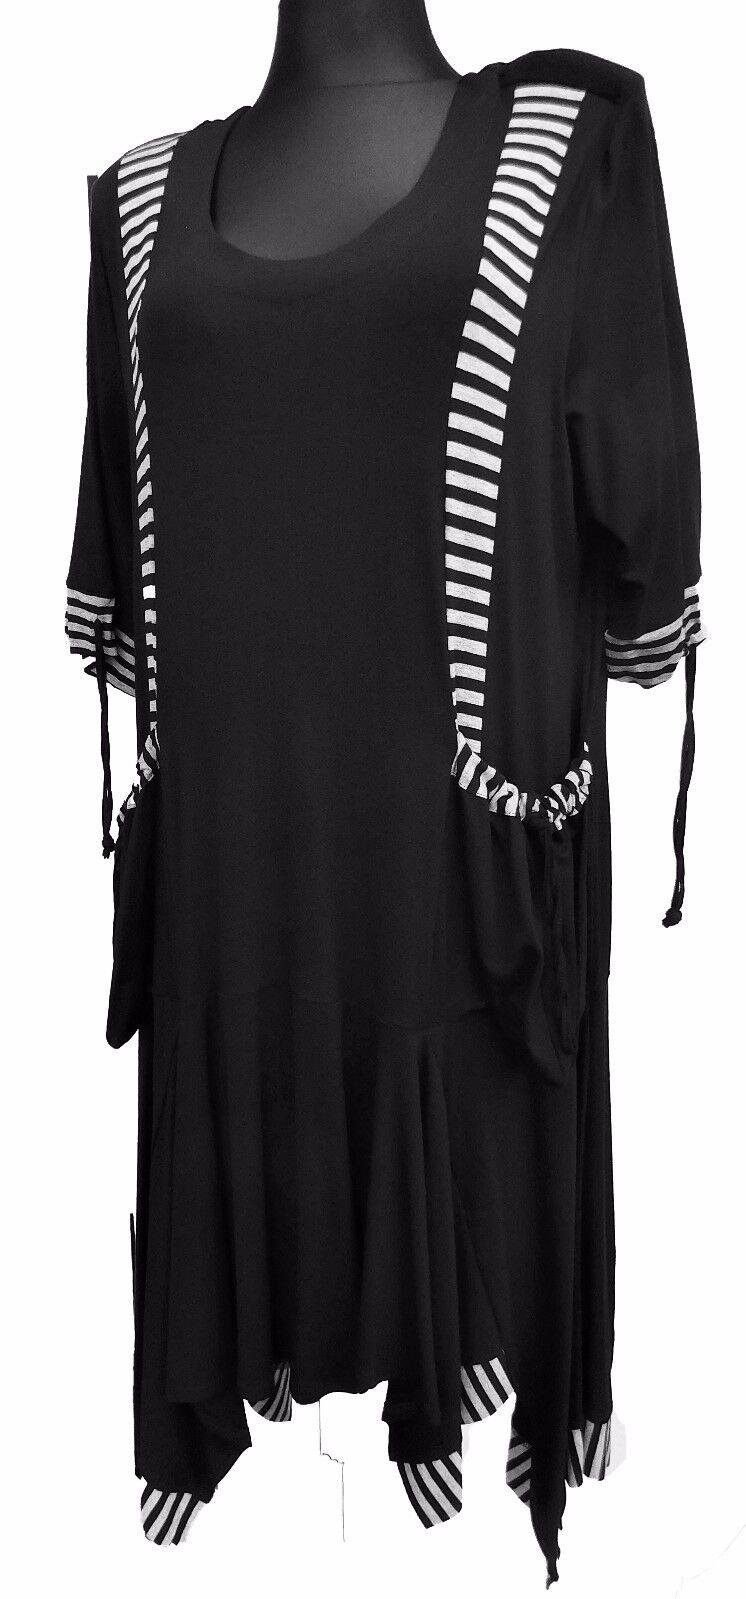 Damen Kleid Lagenlook 3 4 Arm schwarz grau Mustermix Viskose Gr. 44-46 Zipfelig